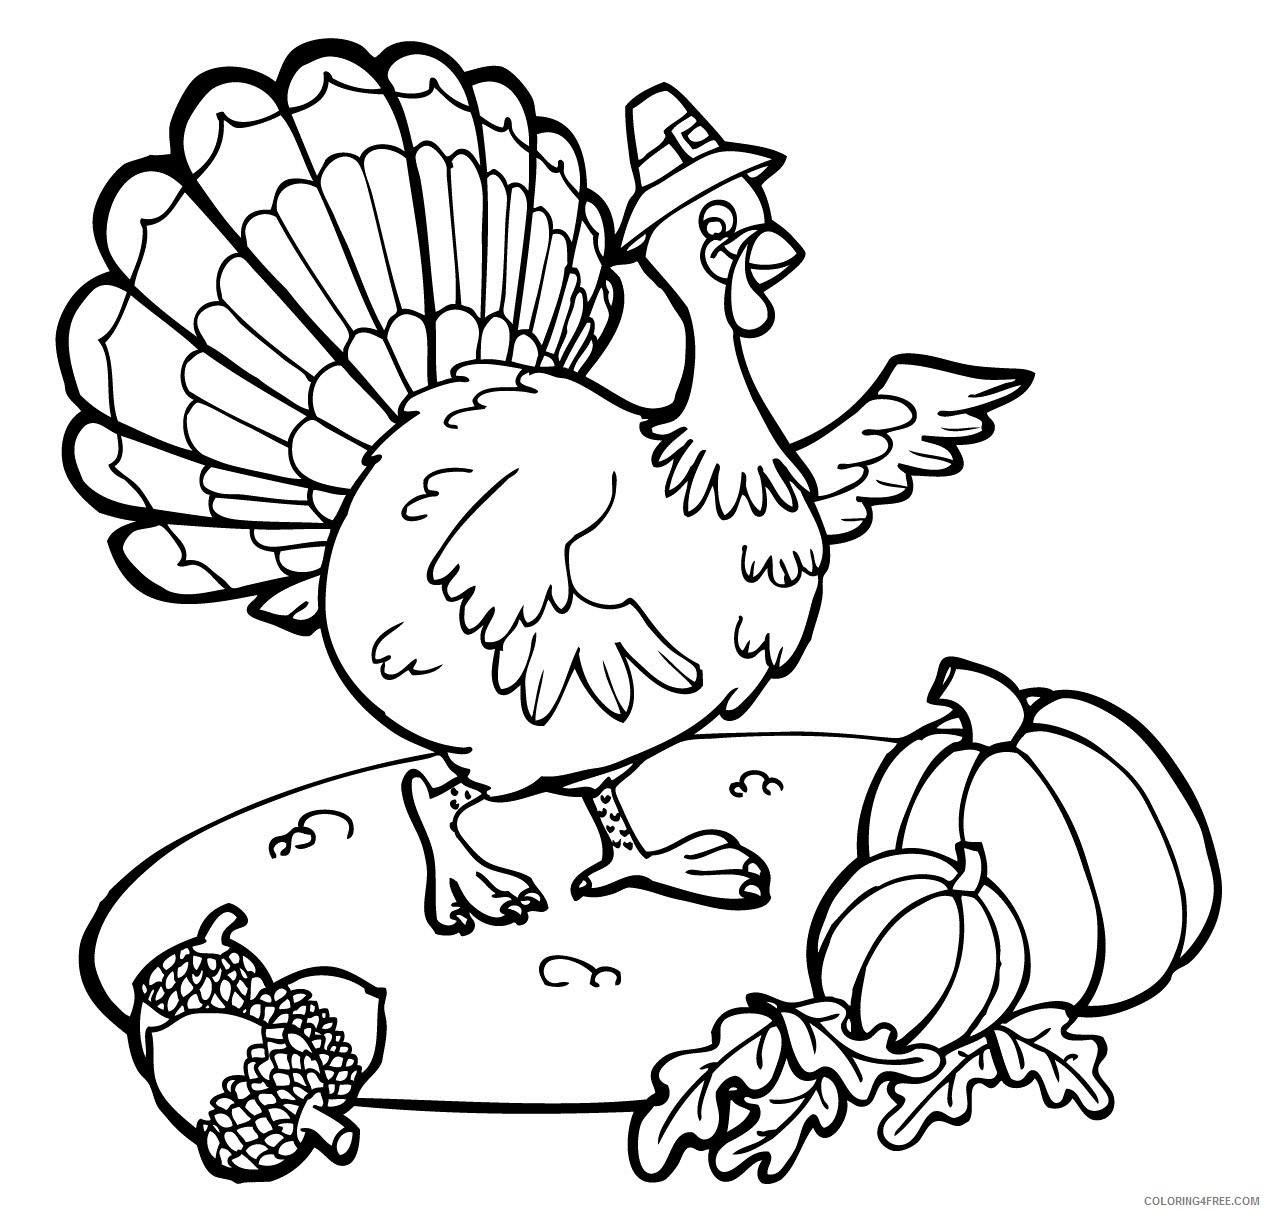 november coloring pages turkey acorn pumpkin Coloring4free